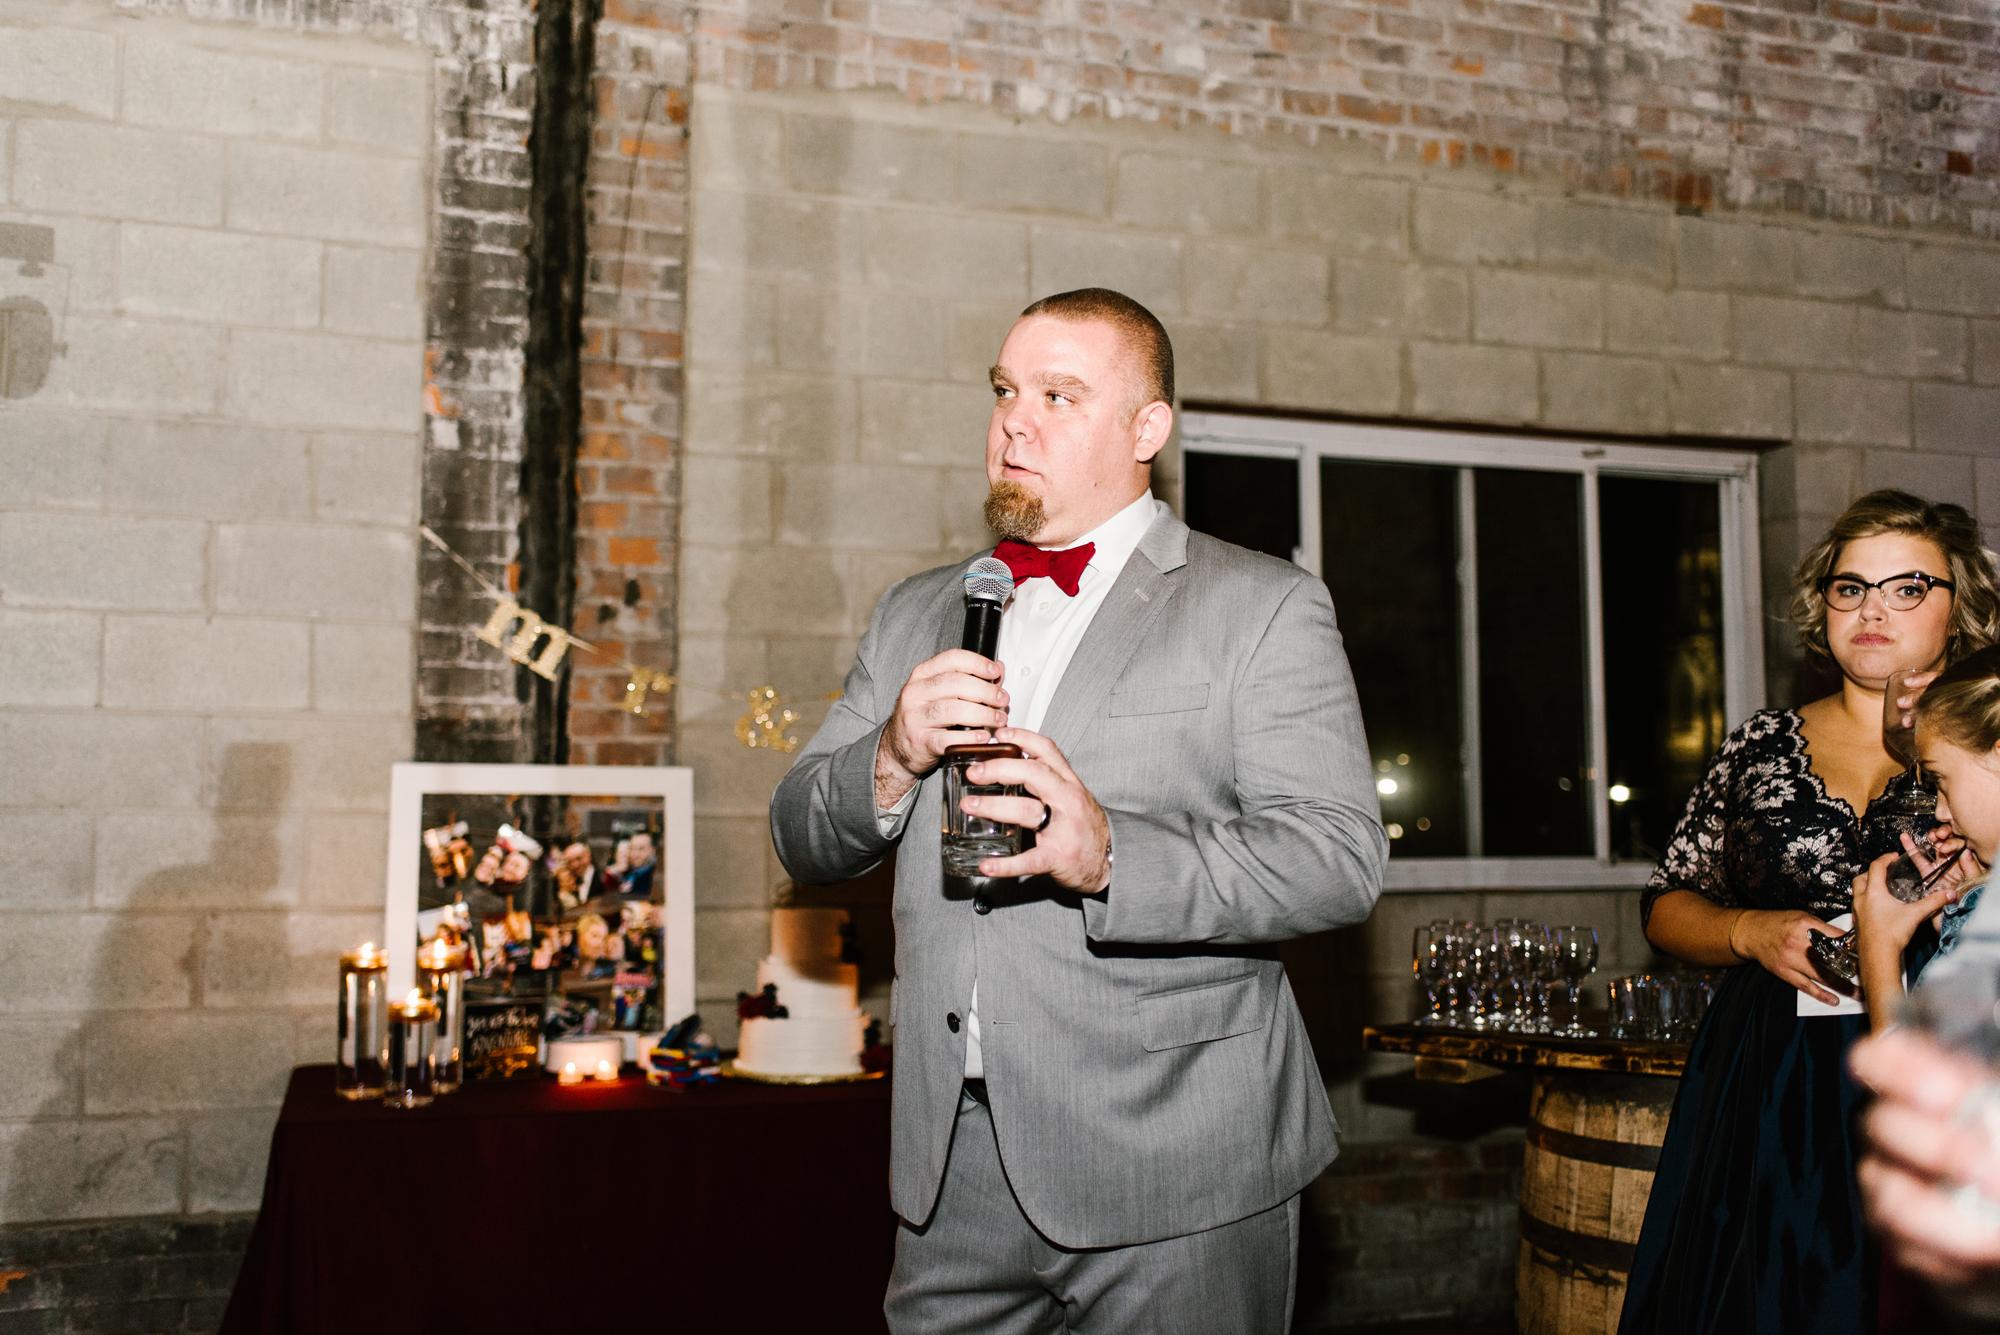 detroit-michigan-eastern-market-loft-wedding-sydney-marie (255).jpg